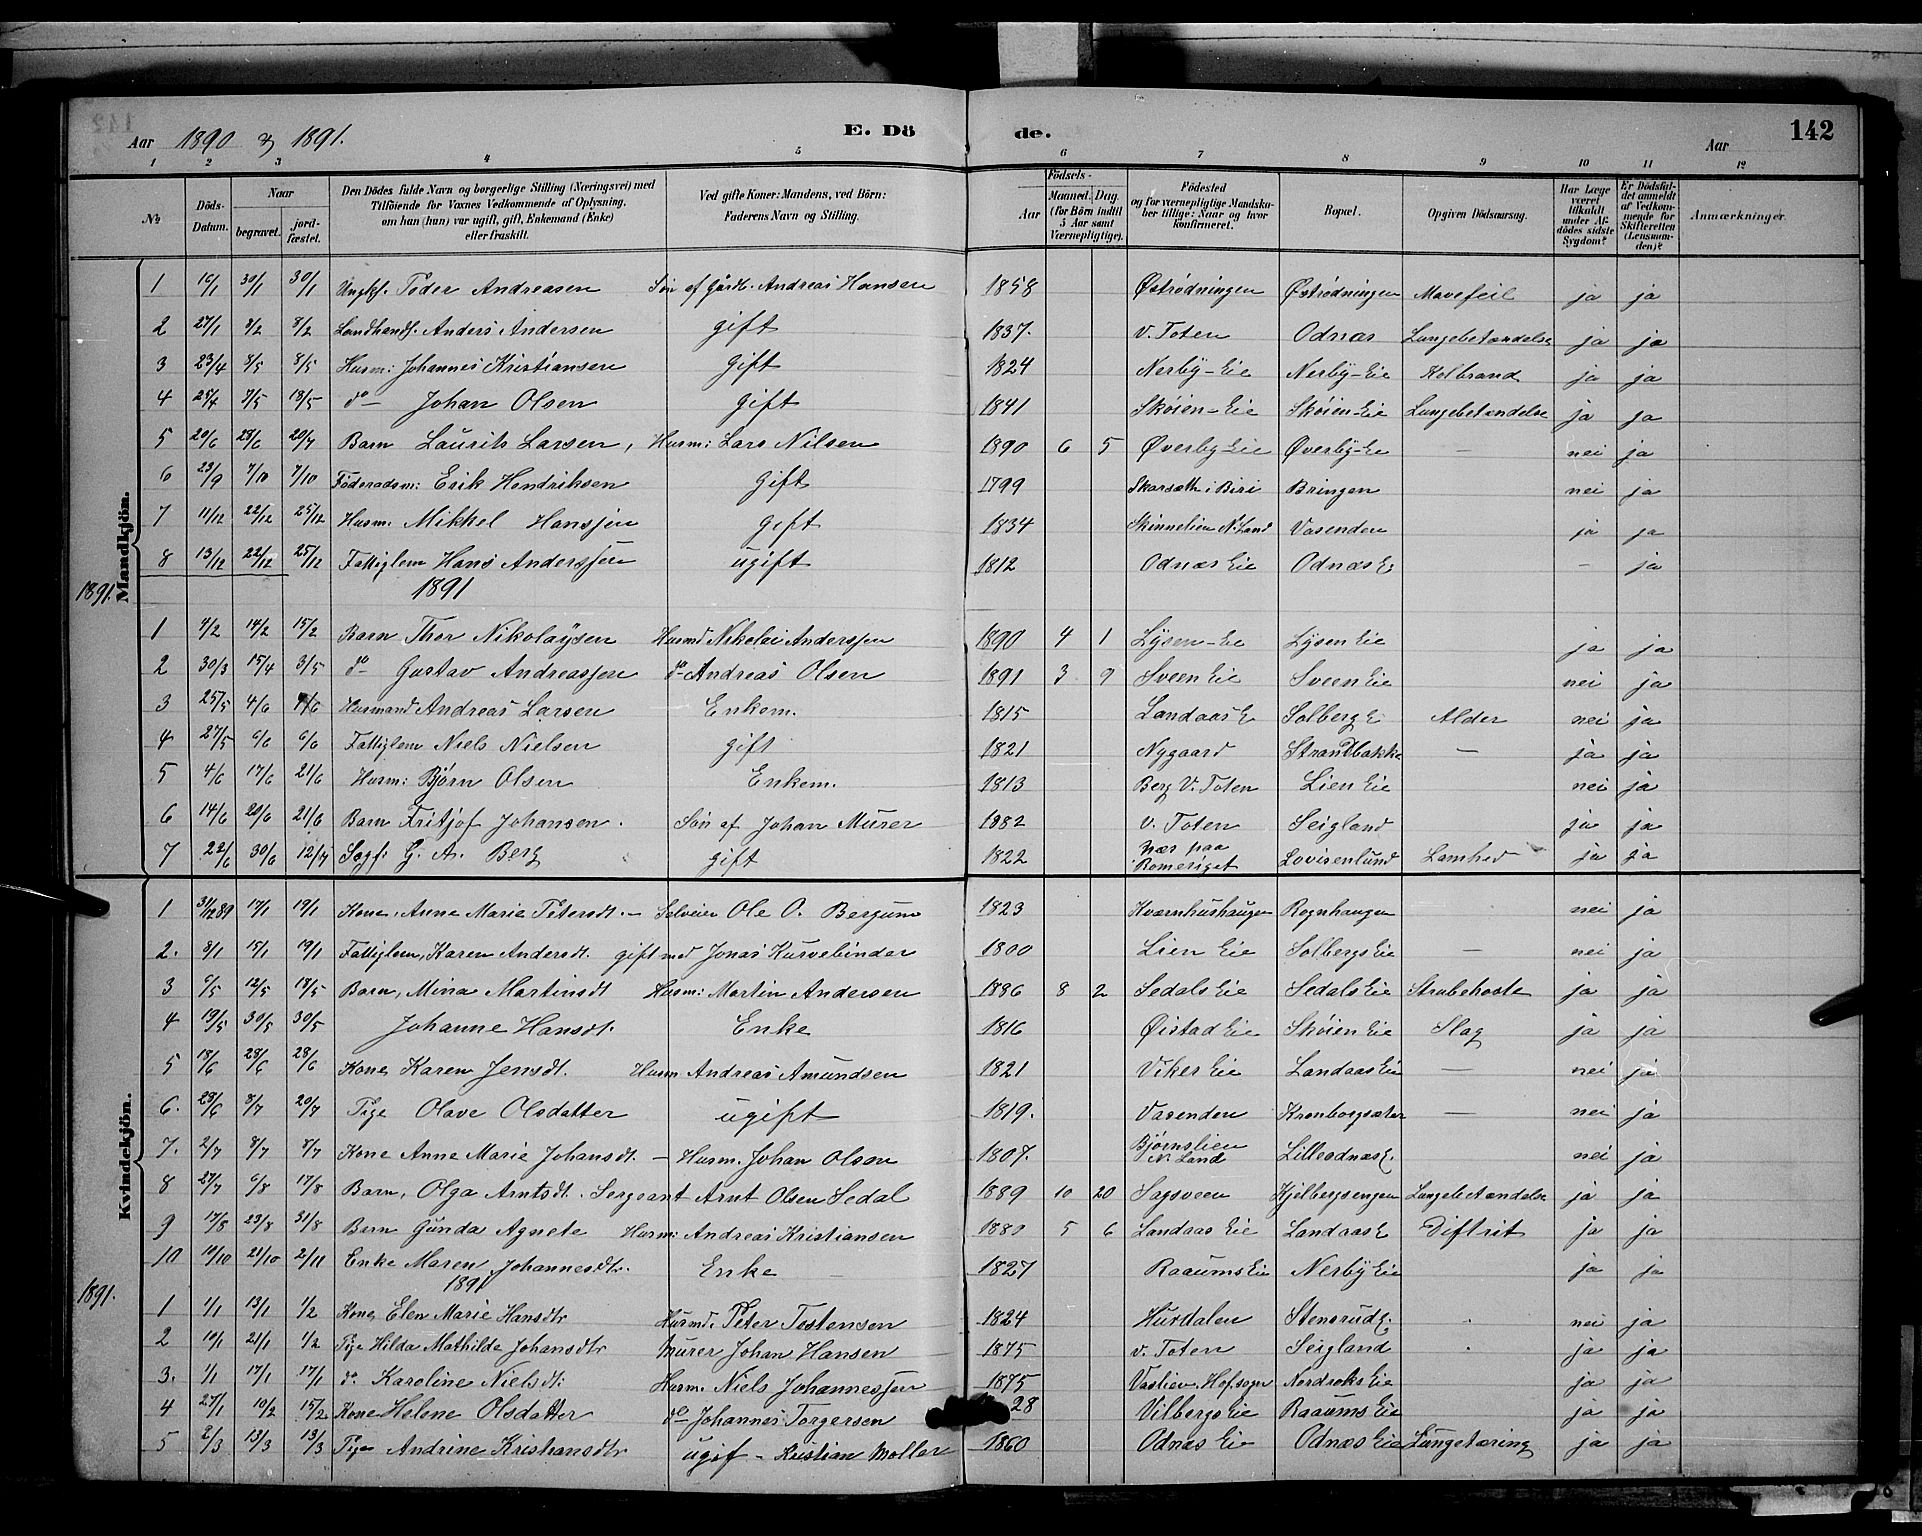 SAH, Søndre Land prestekontor, L/L0003: Klokkerbok nr. 3, 1884-1902, s. 142